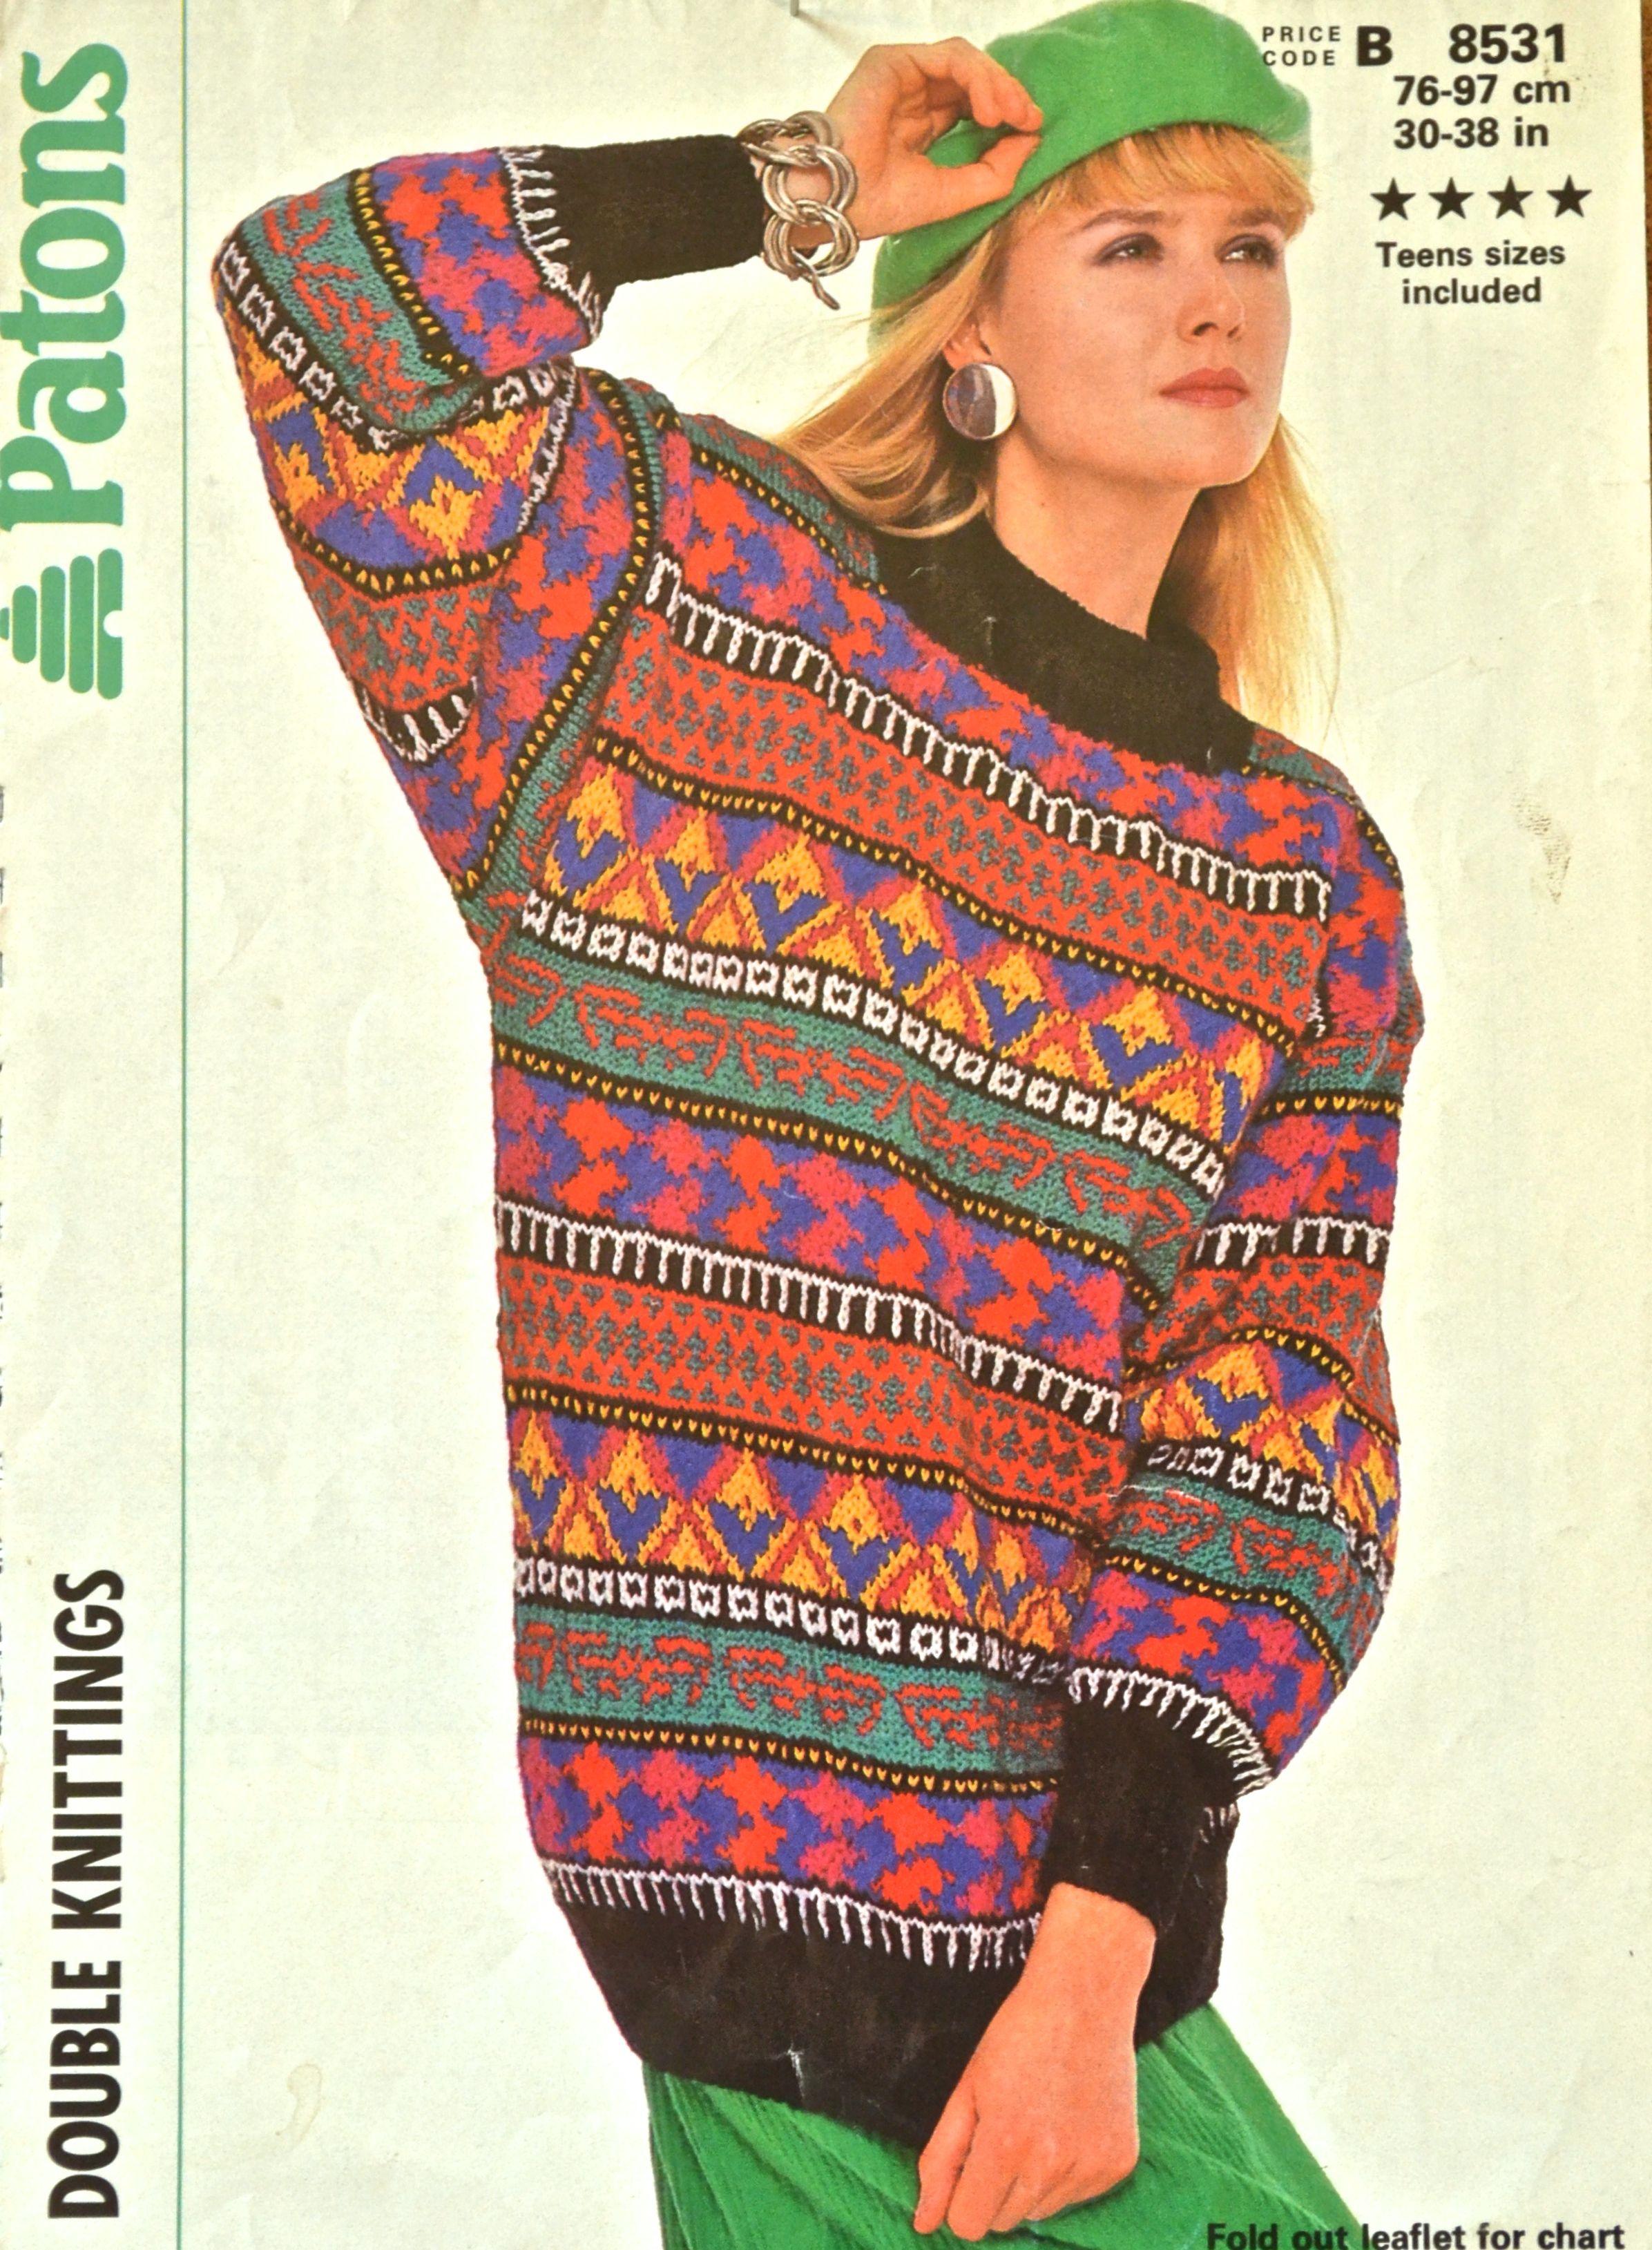 Vintage 80s Knitting Patterns | Jumper knitting pattern ...